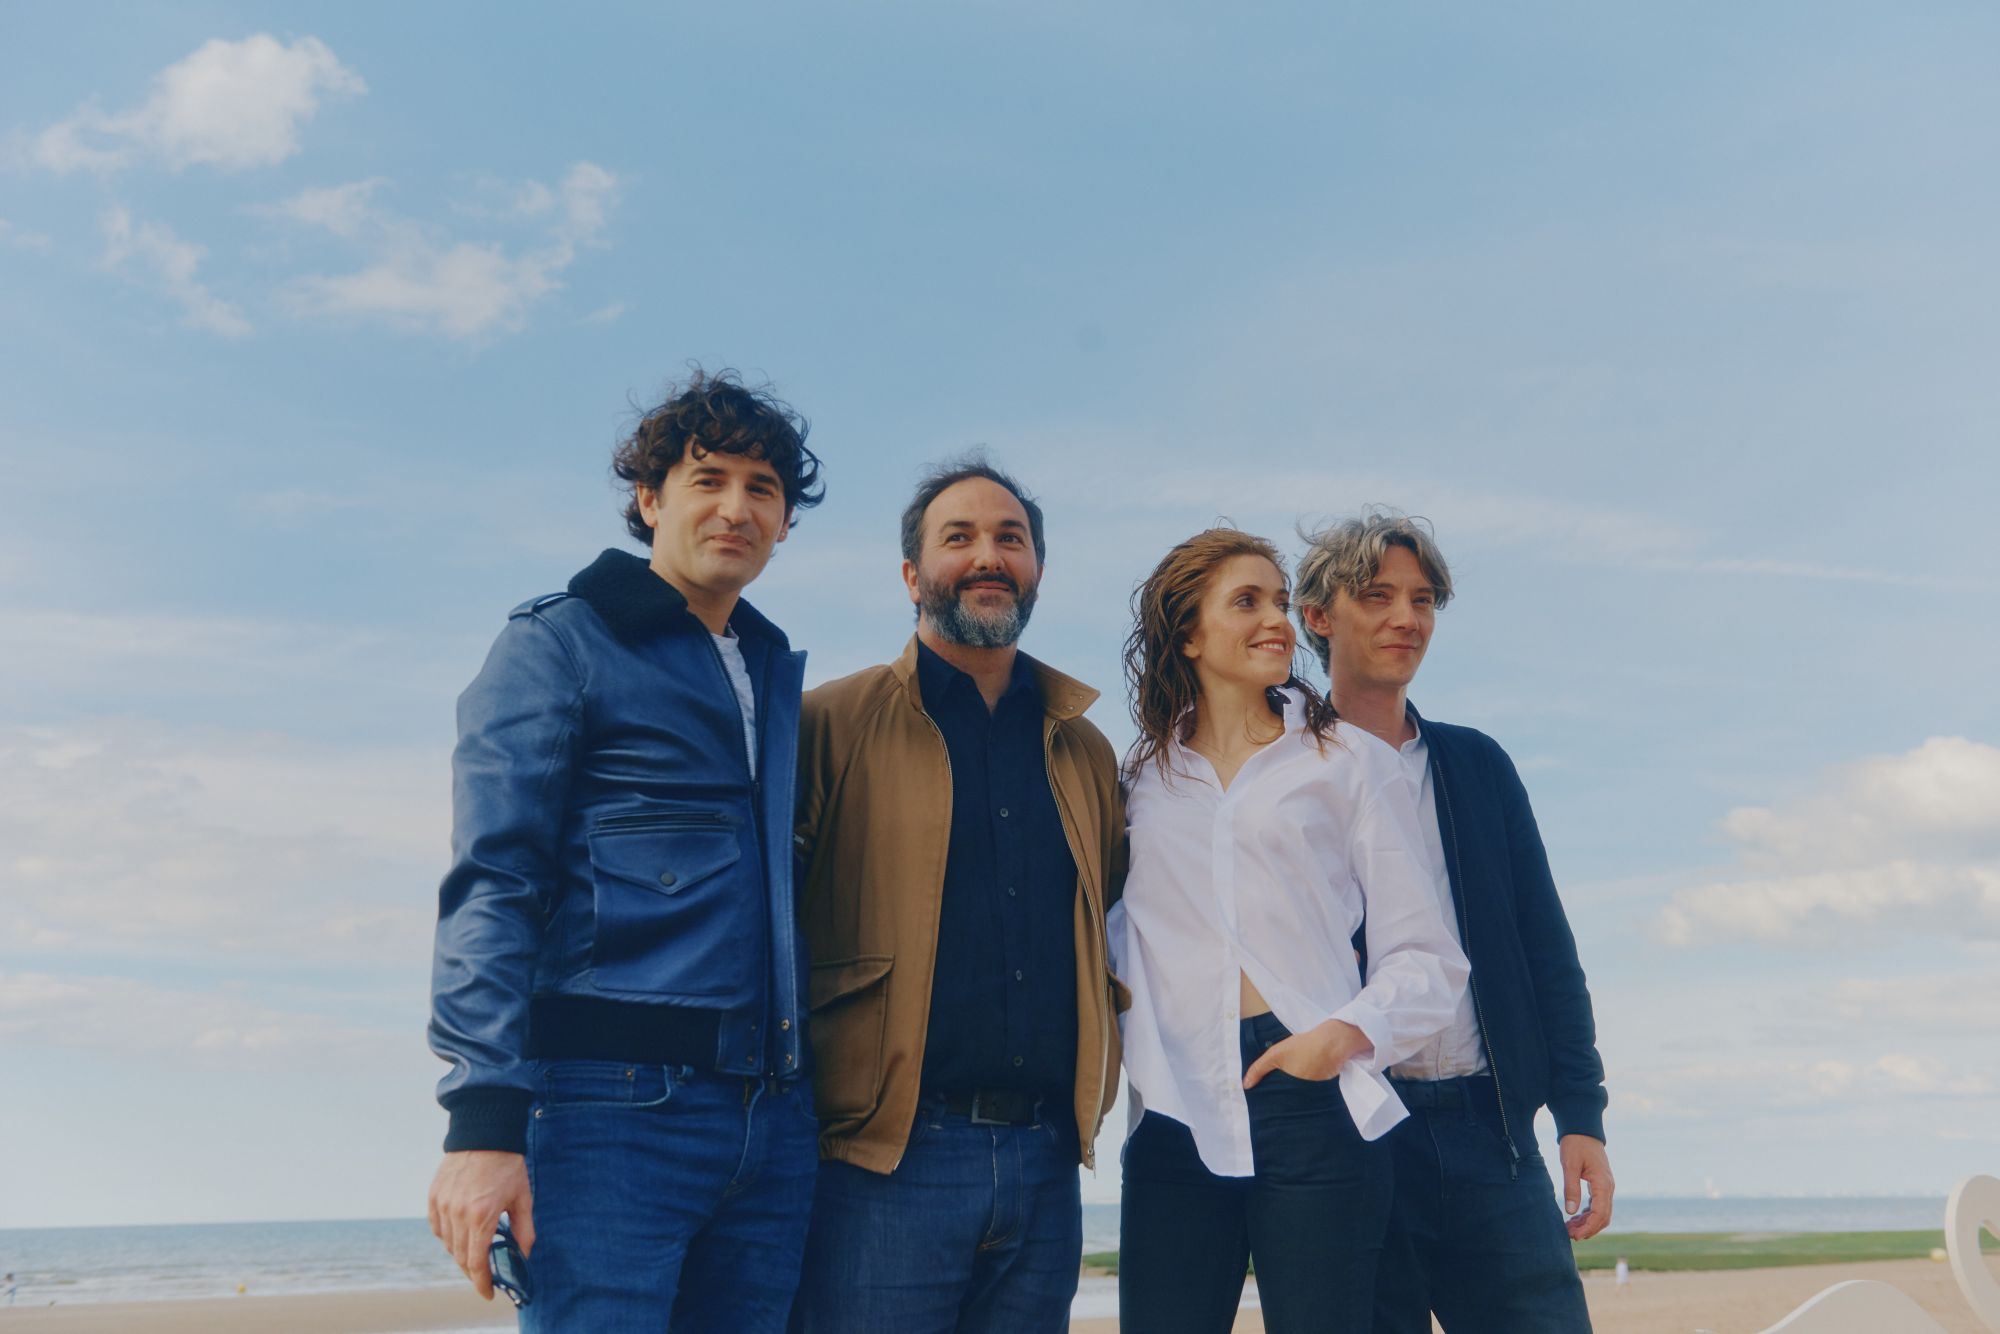 Nicolas Maury (acteur), Erwan Le Duc (réalisateur), Maud Wyler (actrice), Swann Arlaud (acteur) venus présenter